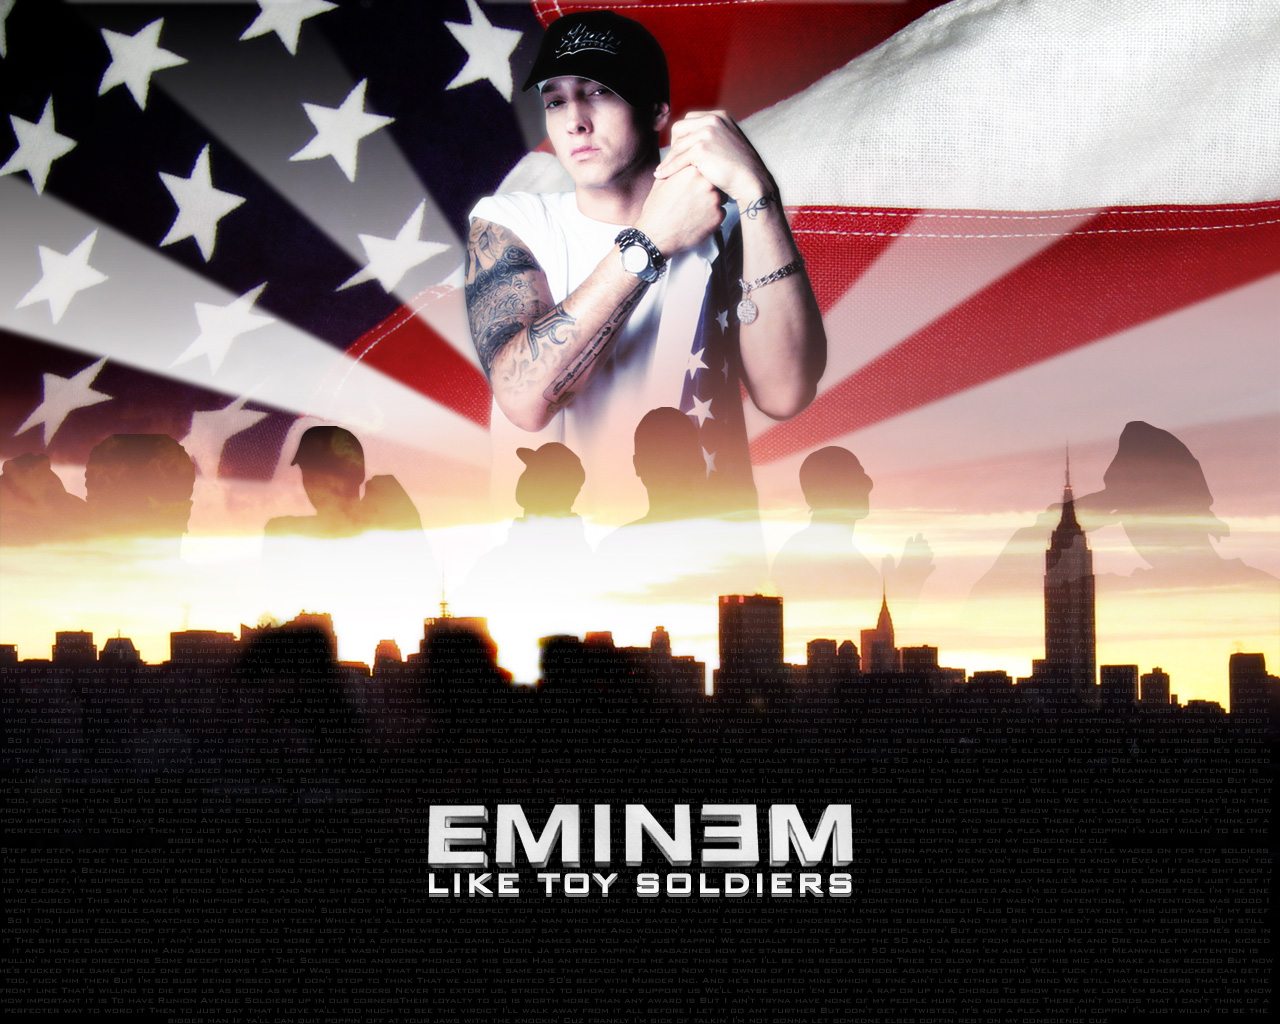 http://4.bp.blogspot.com/_7ub7OOBg4Xc/TVG6mJ_0RNI/AAAAAAAAAqA/uFAjZwXuadw/s1600/Eminem_wallpaper6.jpg